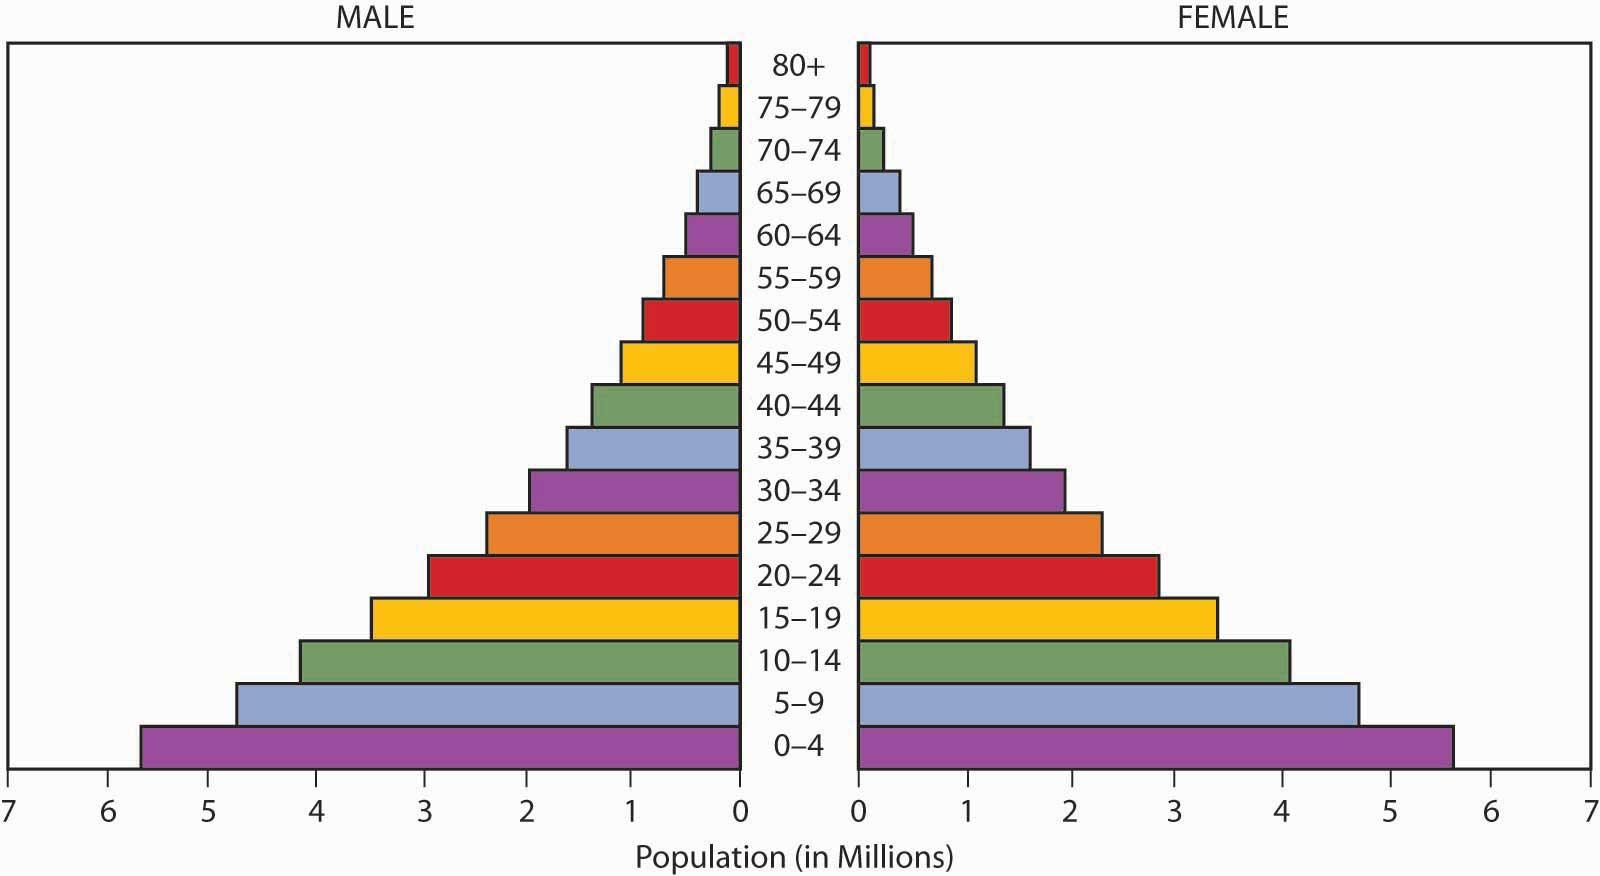 worksheet Population Pyramid Worksheet population pyramid definition gidiye redformapolitica co definition